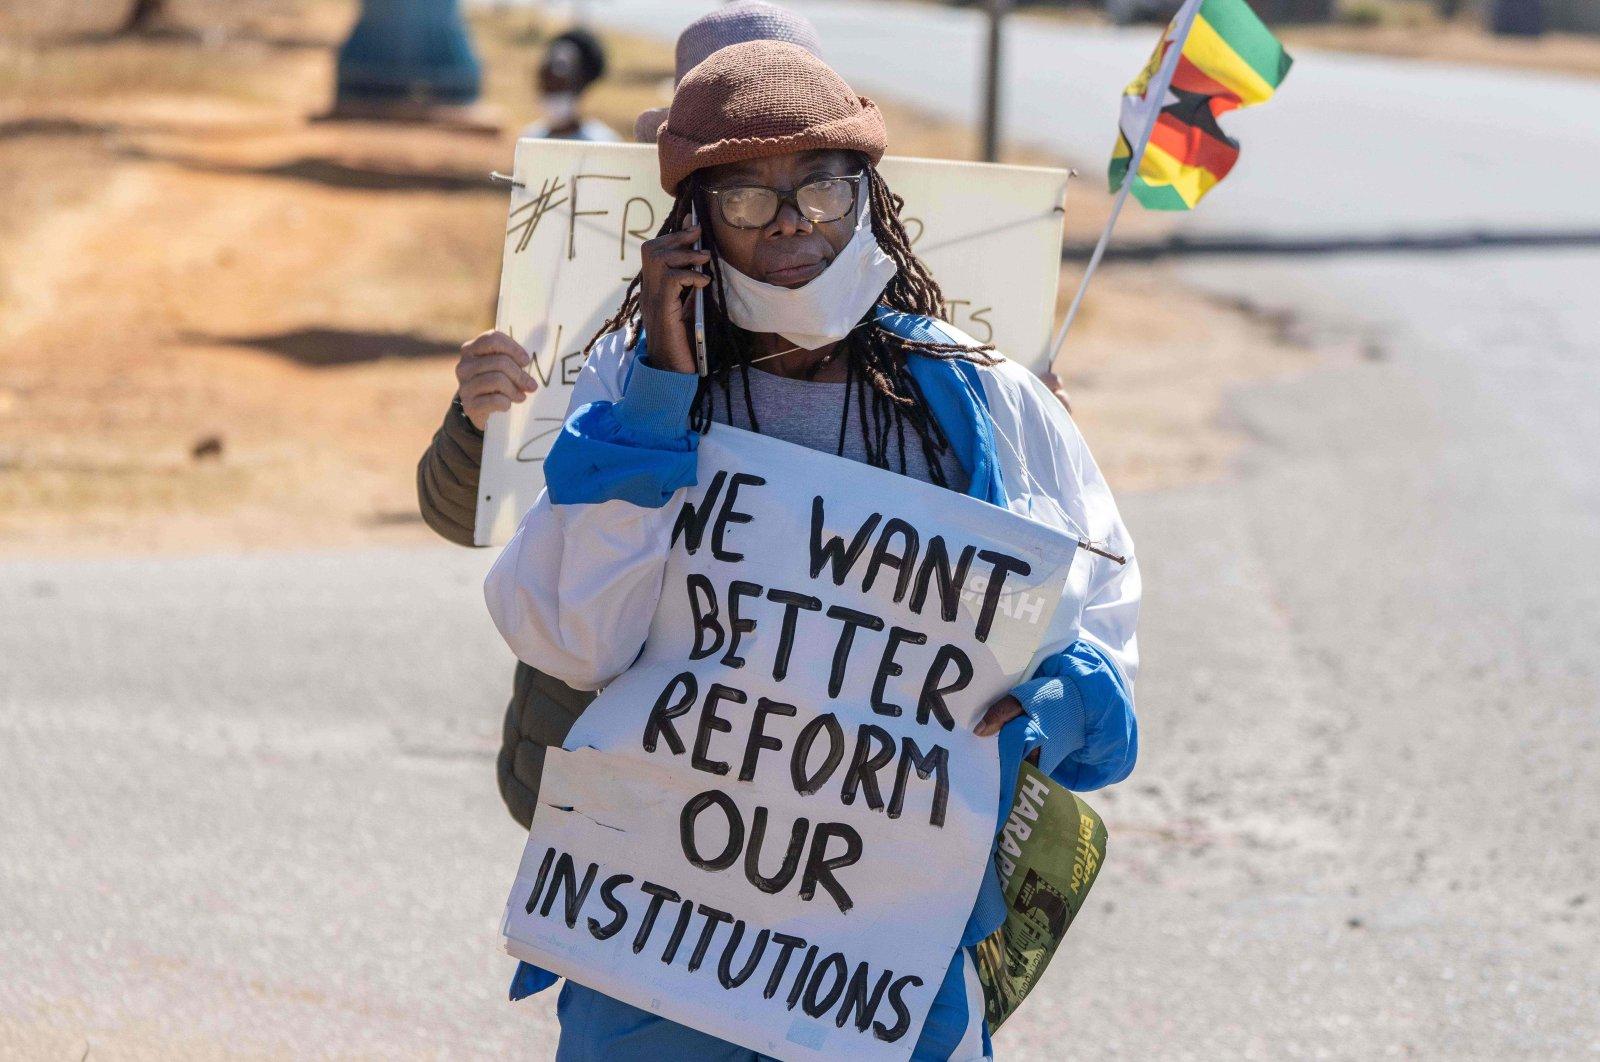 Zimbabwean novelist Tsitsi Dangarembga holds a placard during an anti-corruption protest march along Borrowdale road,  Harare, Zimbabwe, July 31, 2020. (Photo by ZINYANGE AUNTONY / AFP)